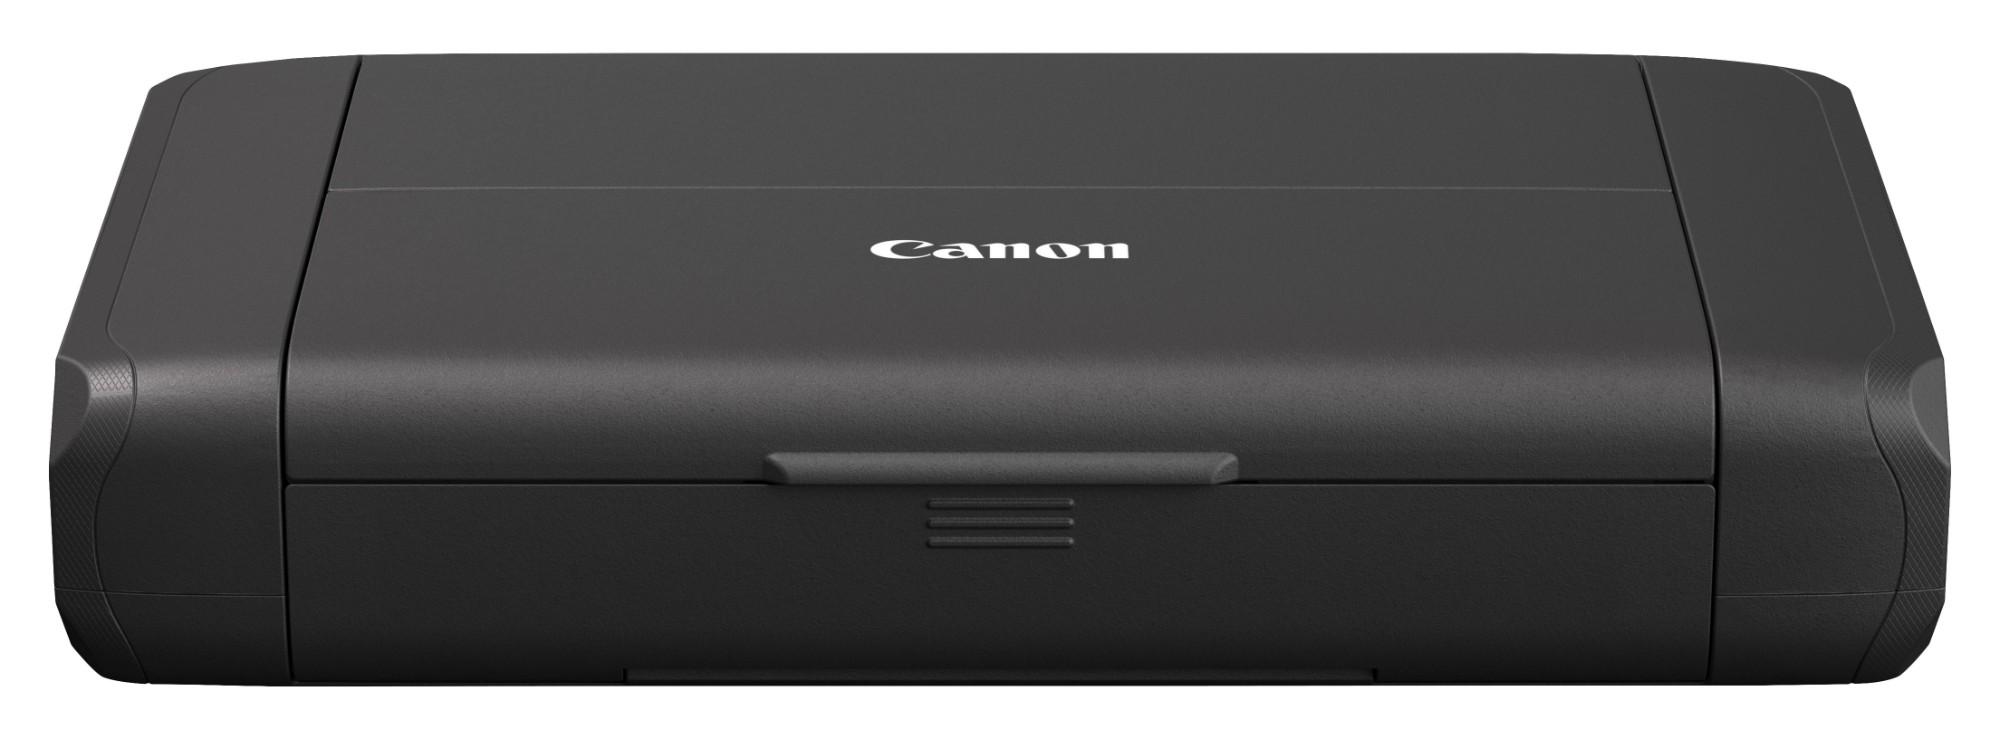 Canon PIXMA TR150 photo printer Inkjet 4800 x 1200 DPI 8